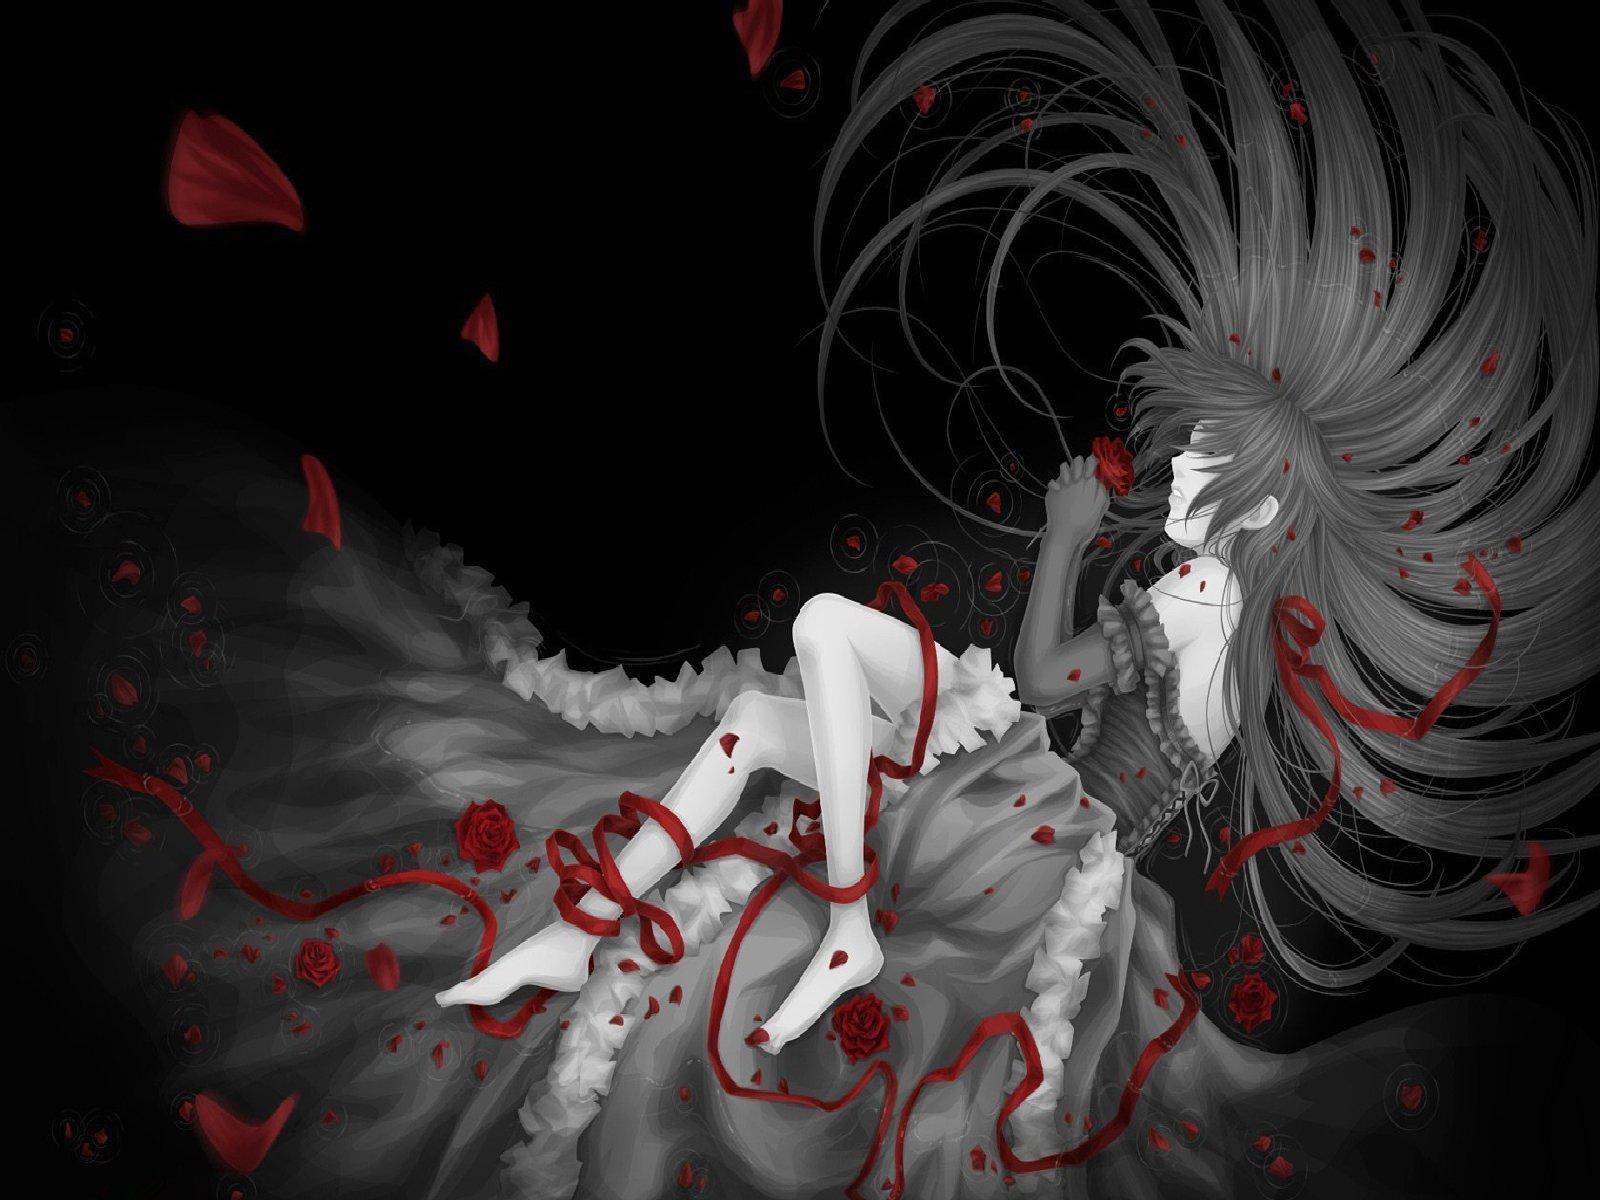 Cool dark anime wallpapers wallpapersafari - Dark anime girl pics ...